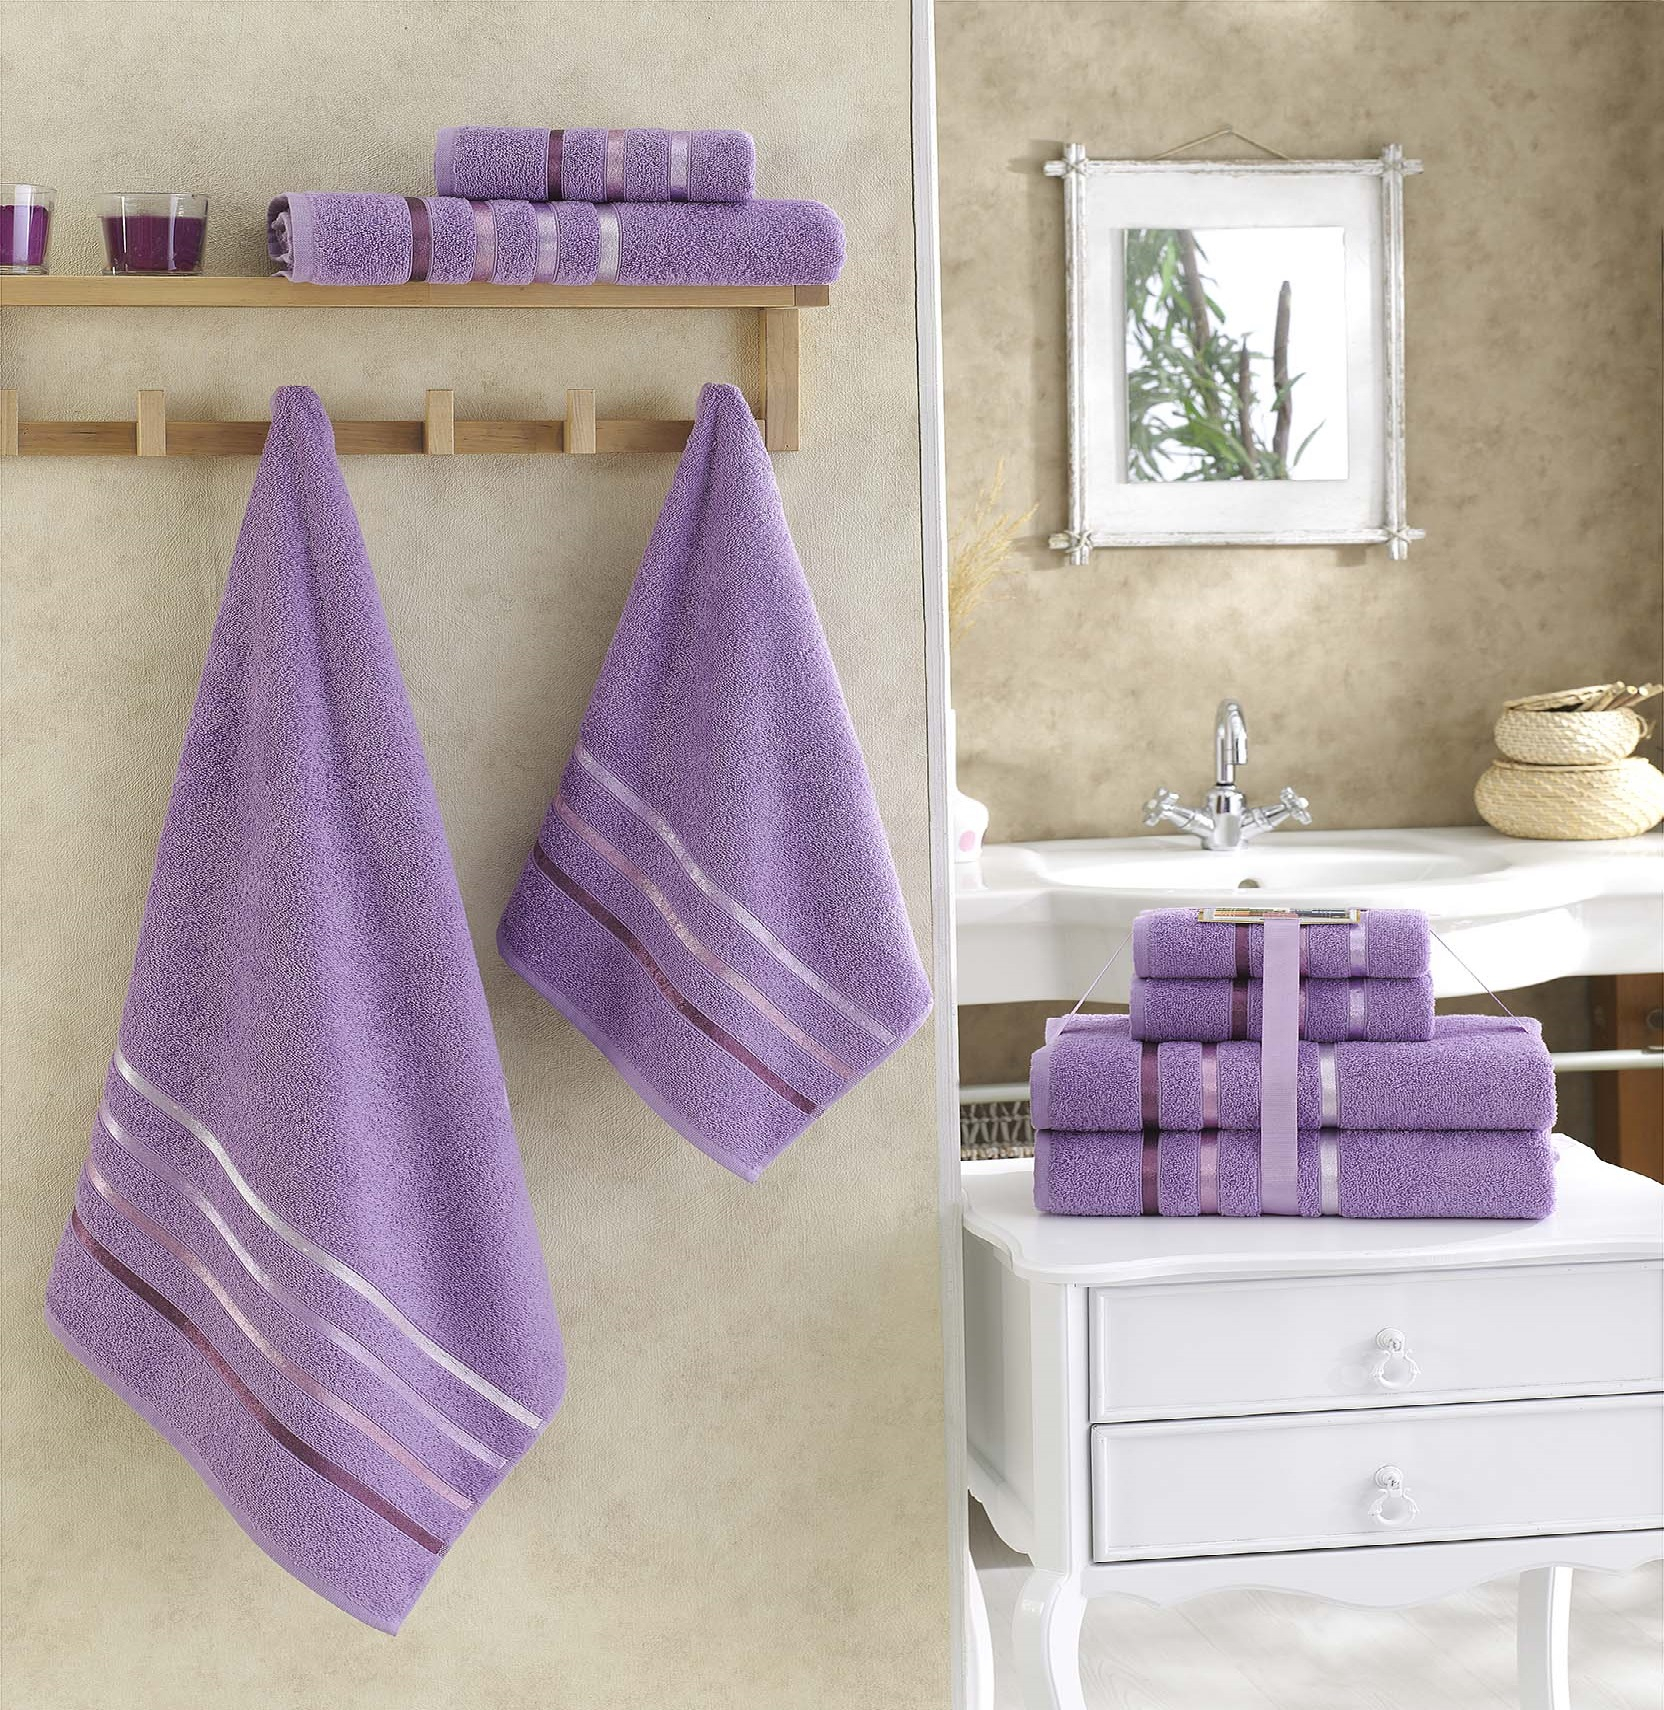 Купить Полотенца Karna, Полотенце Bale Цвет: Сиреневый (Набор), Турция, Махра